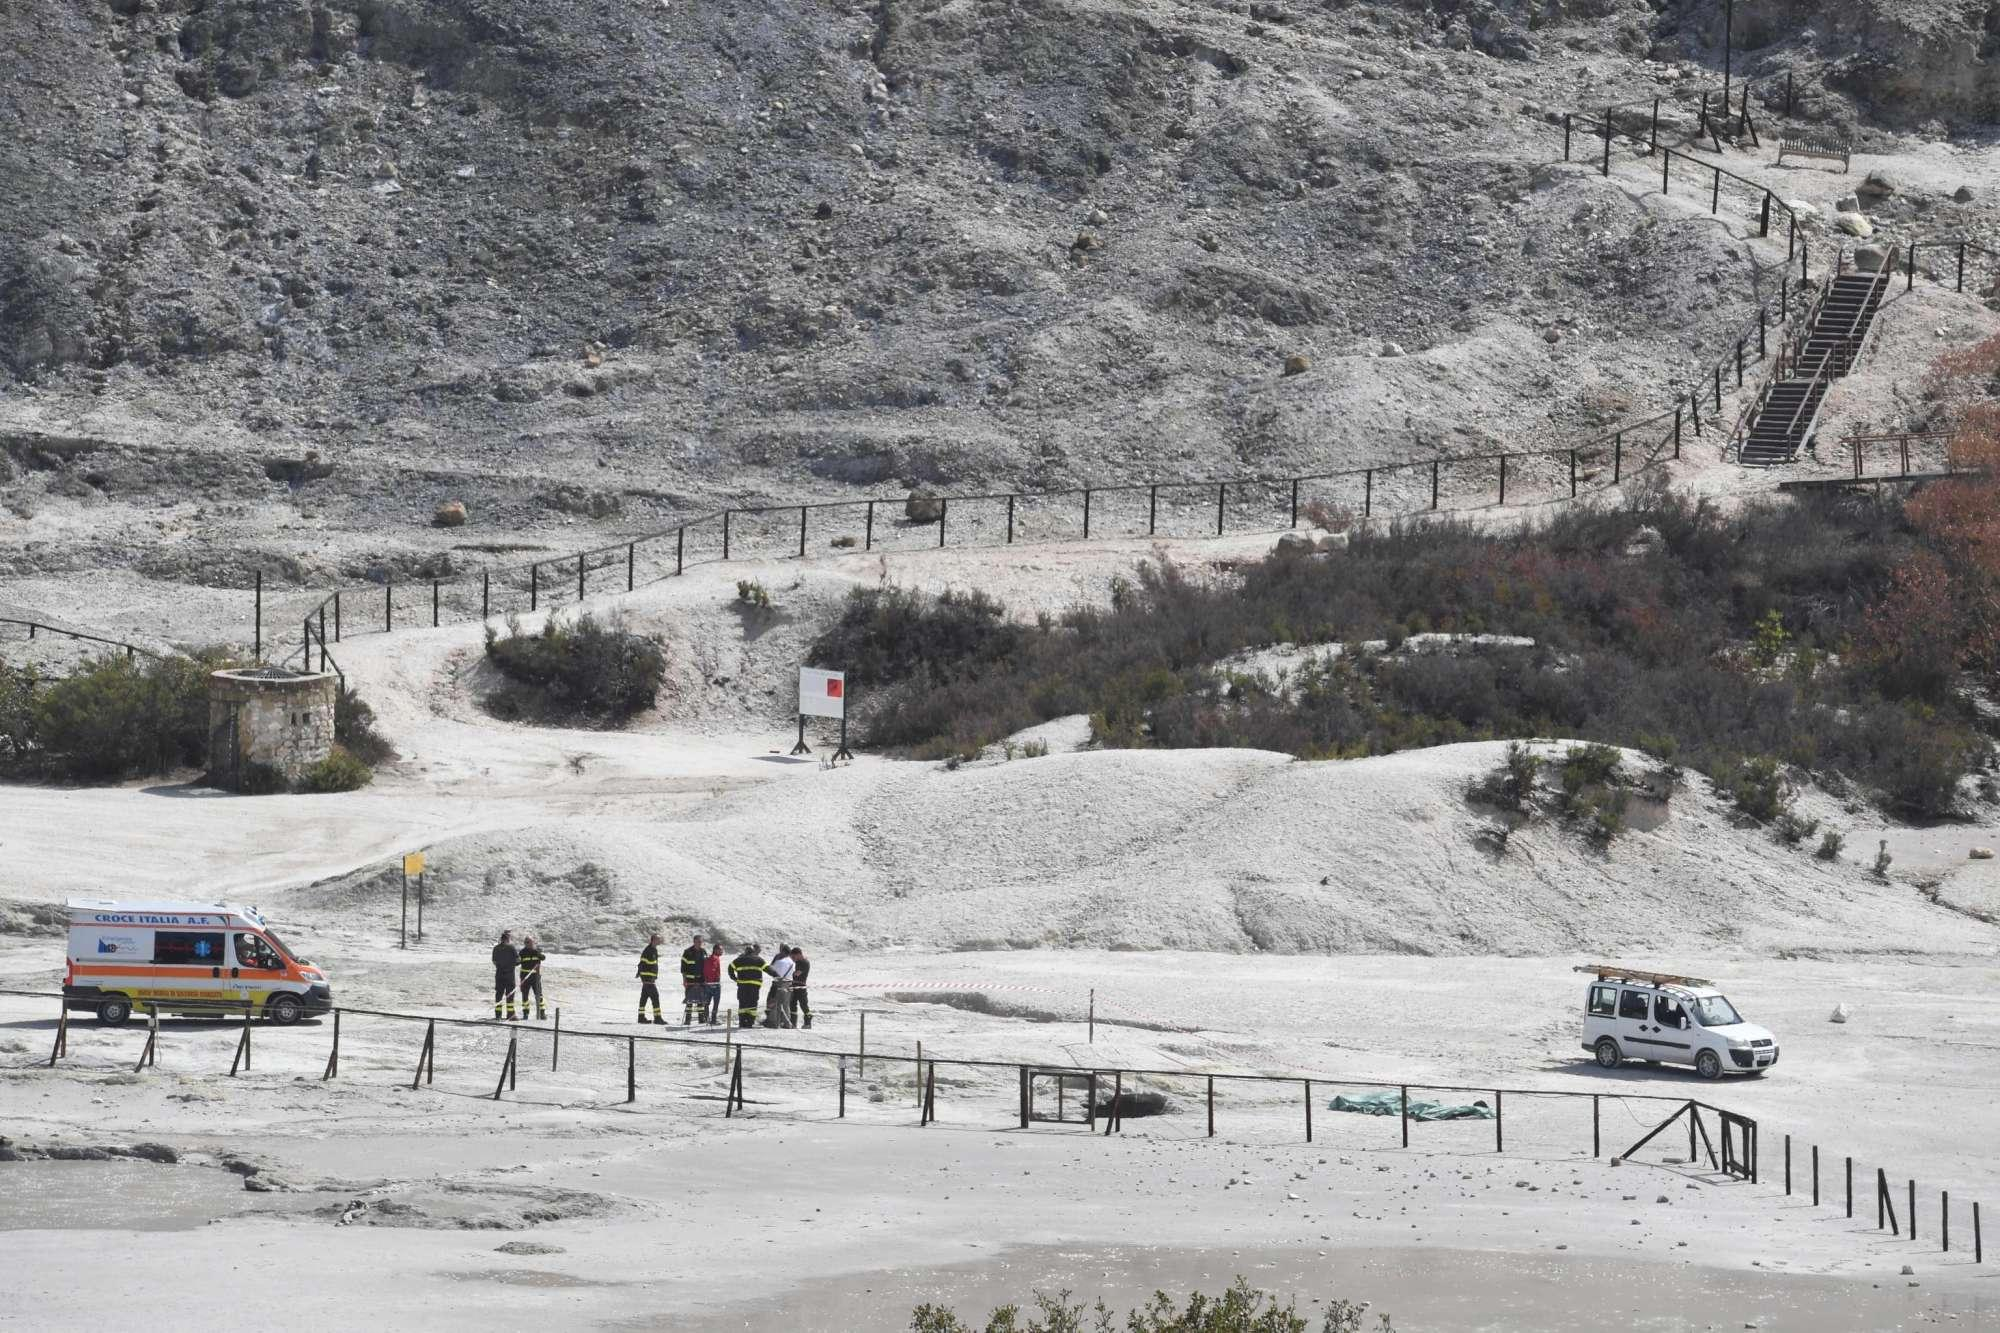 solfatara family dies volcanic crater, volcnic crater Campi Flegrei, amily falls volcanic crater Campi Flegrei